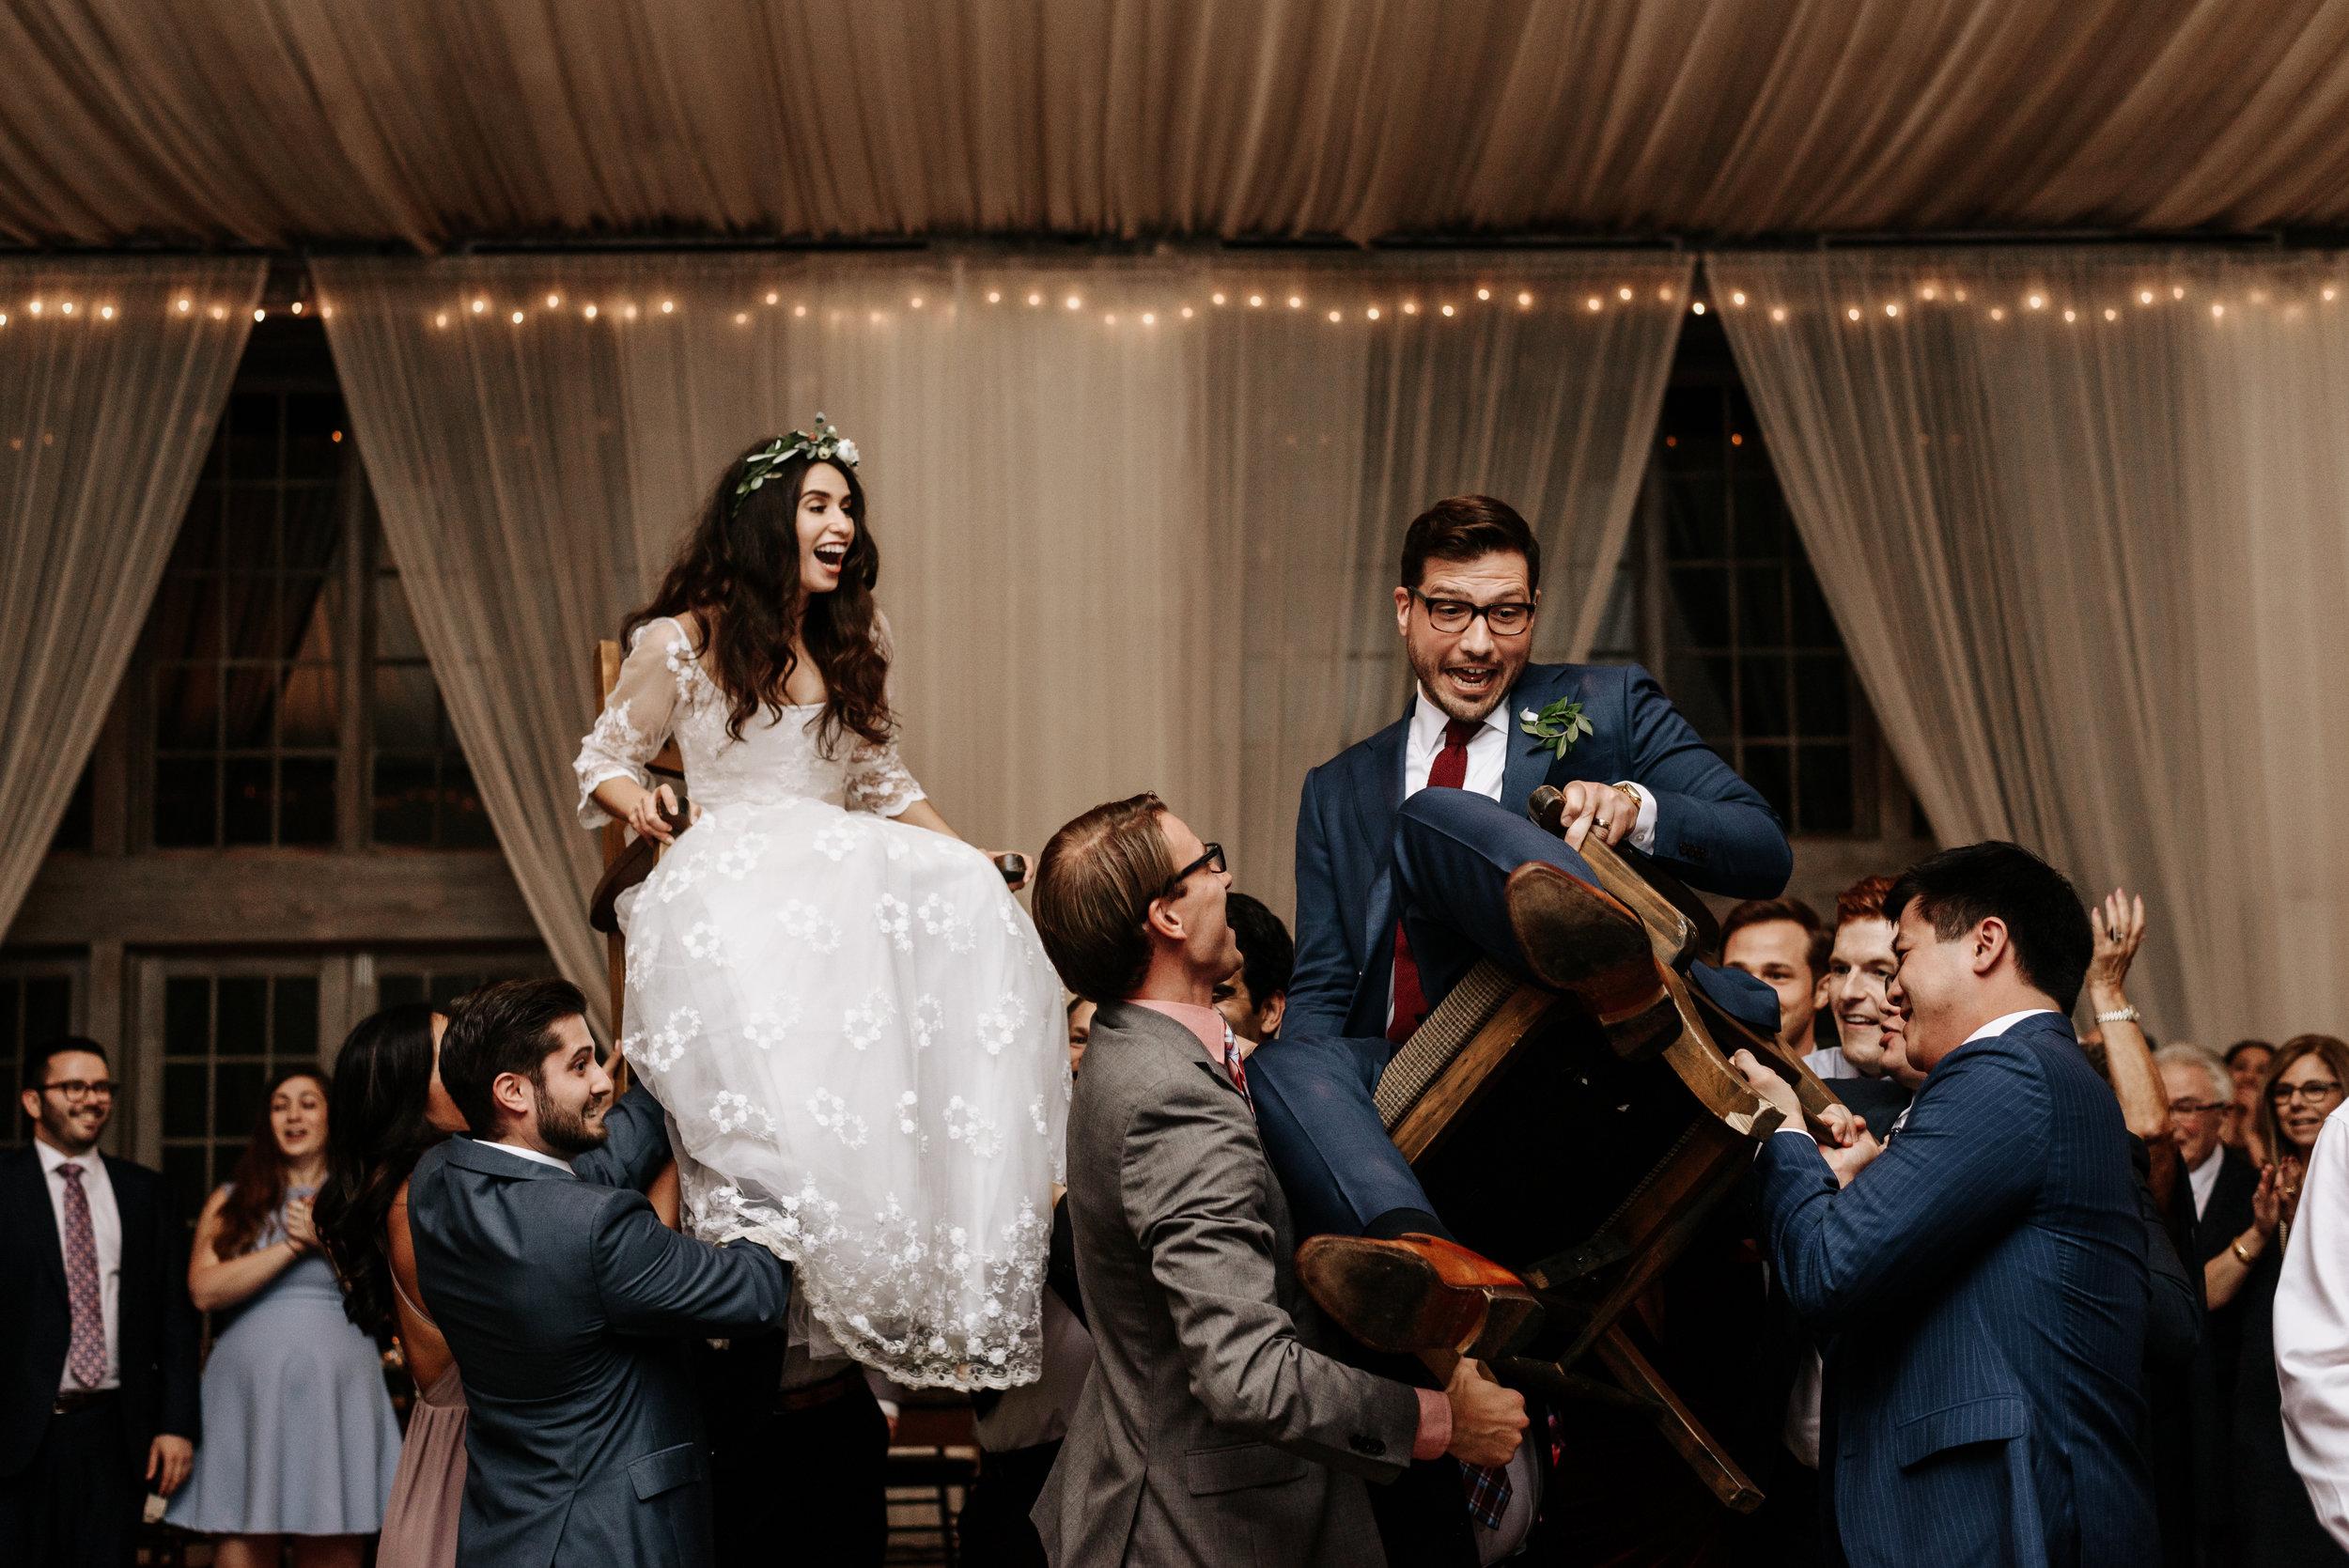 Veritas-Vineyards-and-Winery-Wedding-Photography-Afton-Virginia-Yasmin-Seth-Photography-by-V-3273.jpg